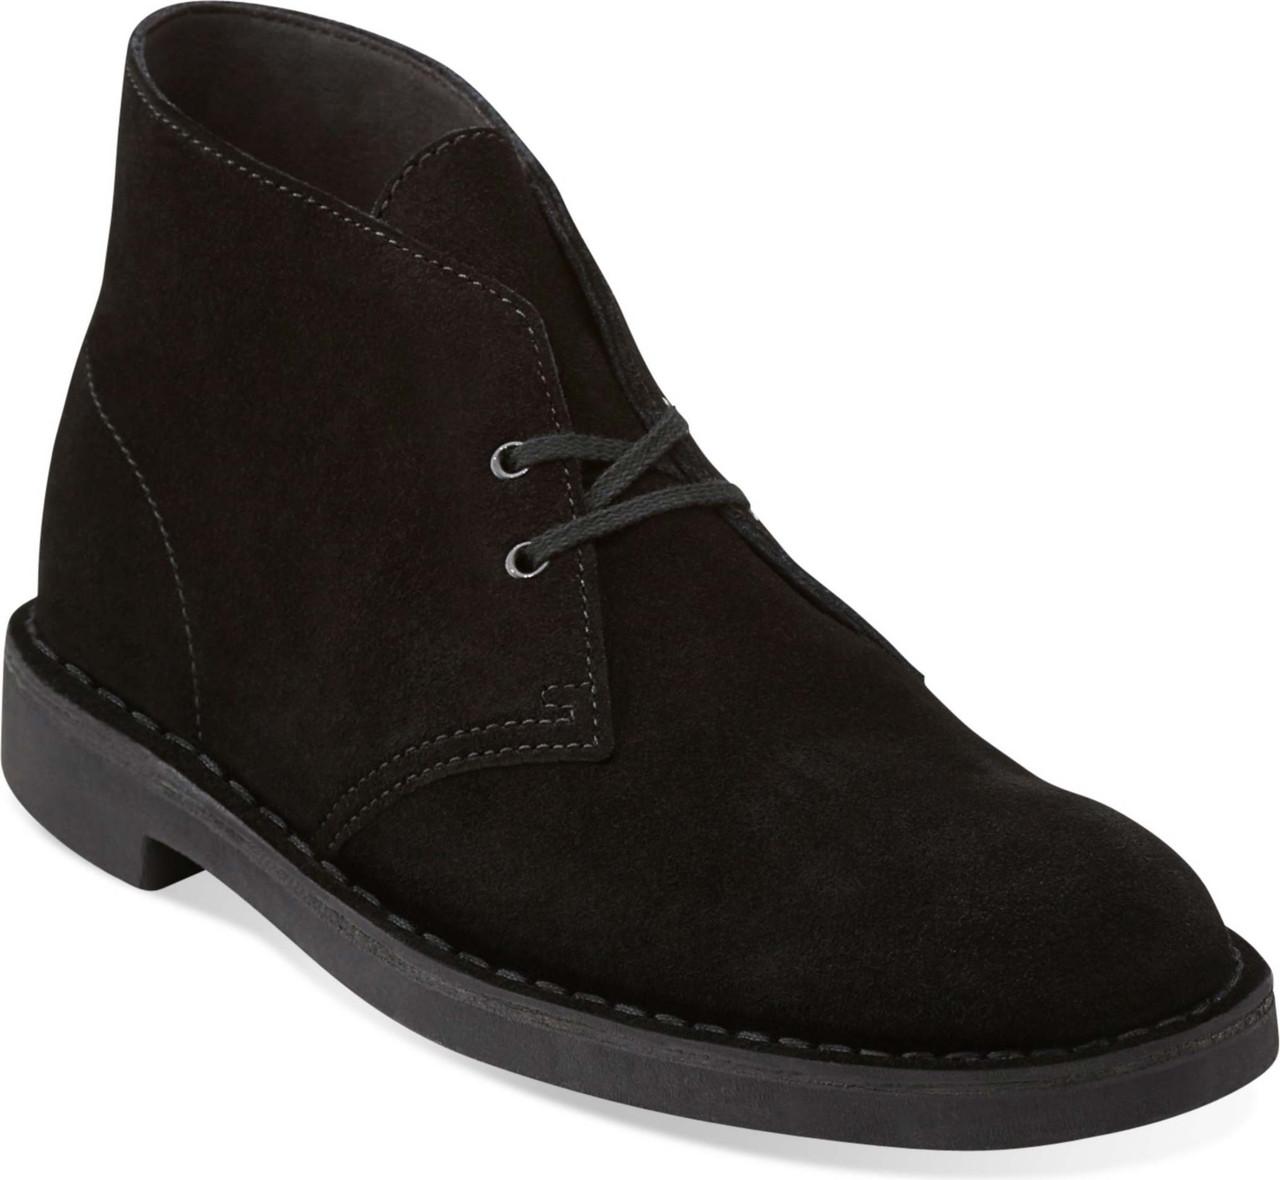 47cf1640feb ... Boots; Clarks Men's Bushacre 2. Beeswax Leather. Beeswax Leather; Black  Leather; Black Suede ...